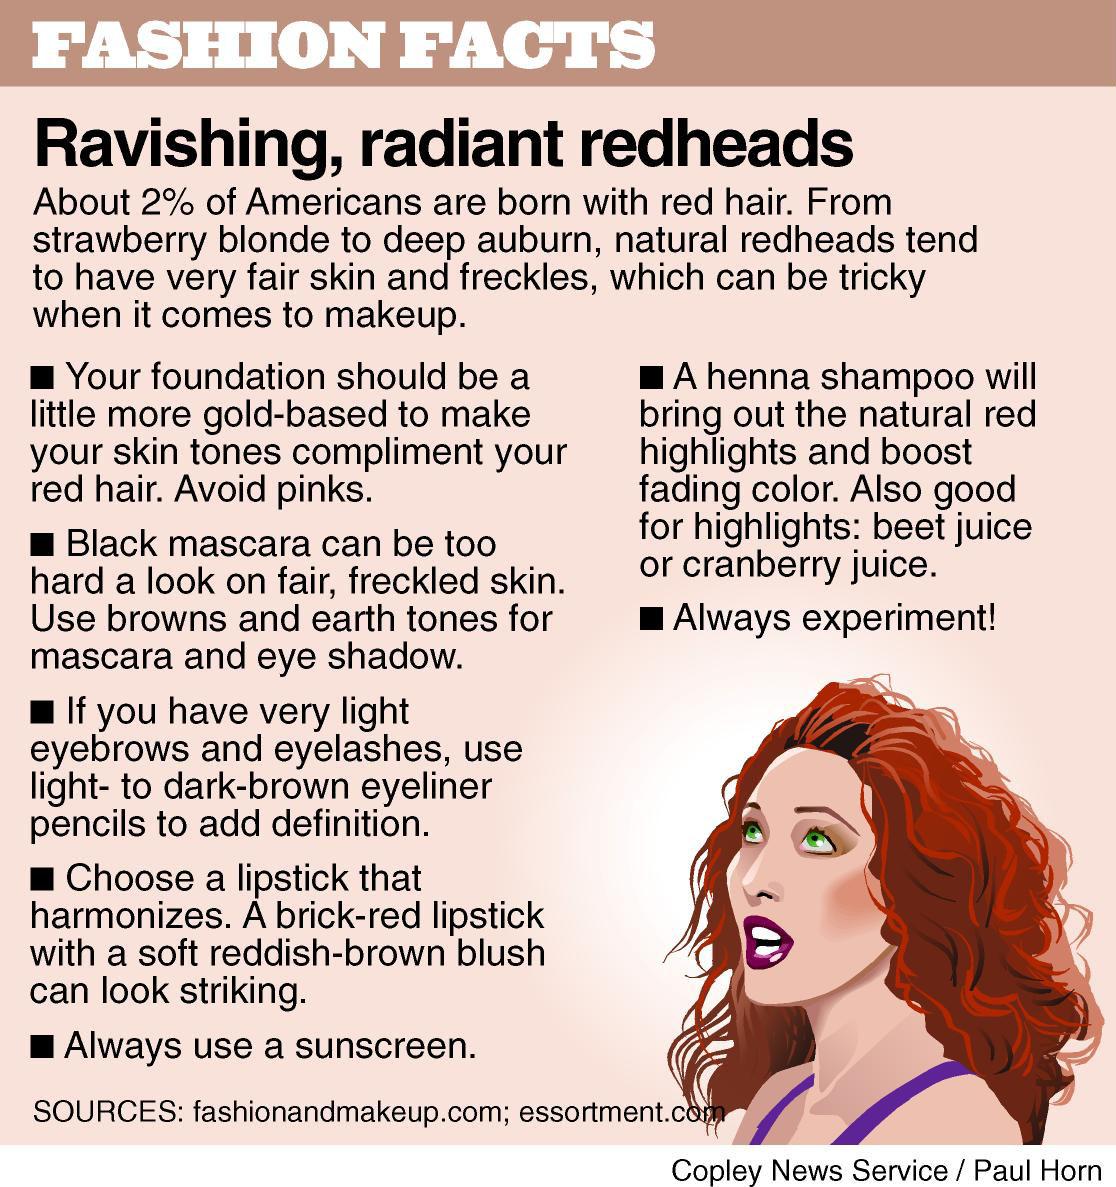 Ravishing, Radiant Redheads